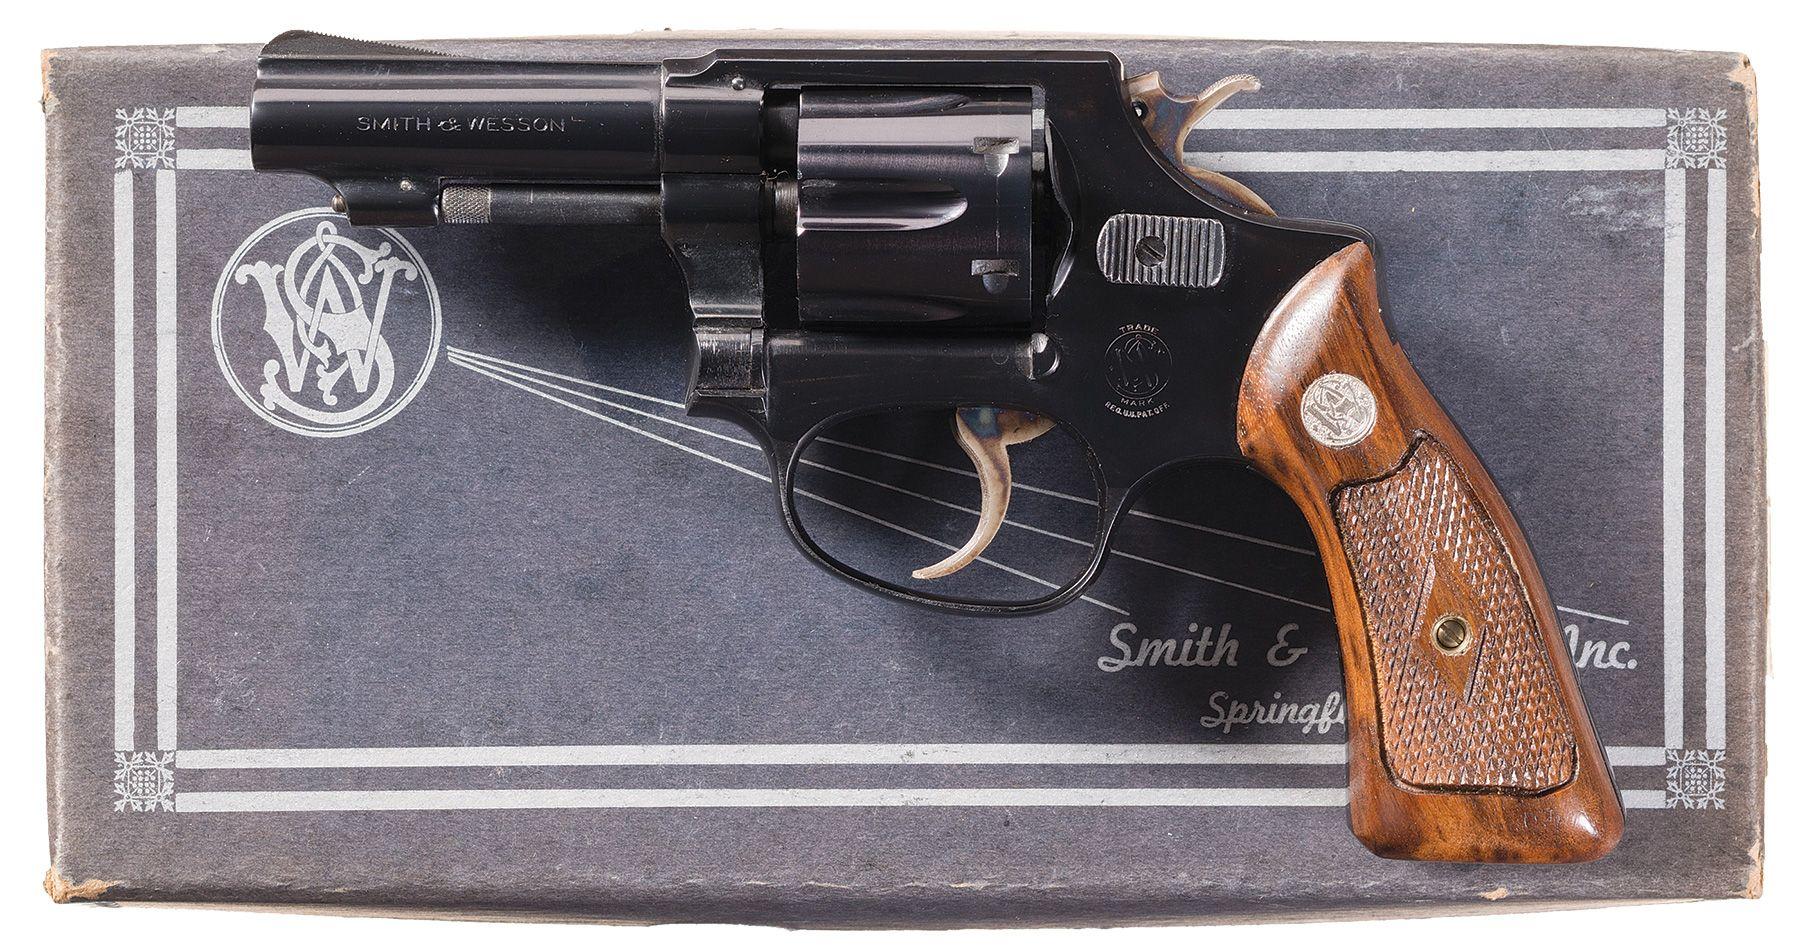 Smith & Wesson  32 Regulation Police (Post-War) Pre-Model 31